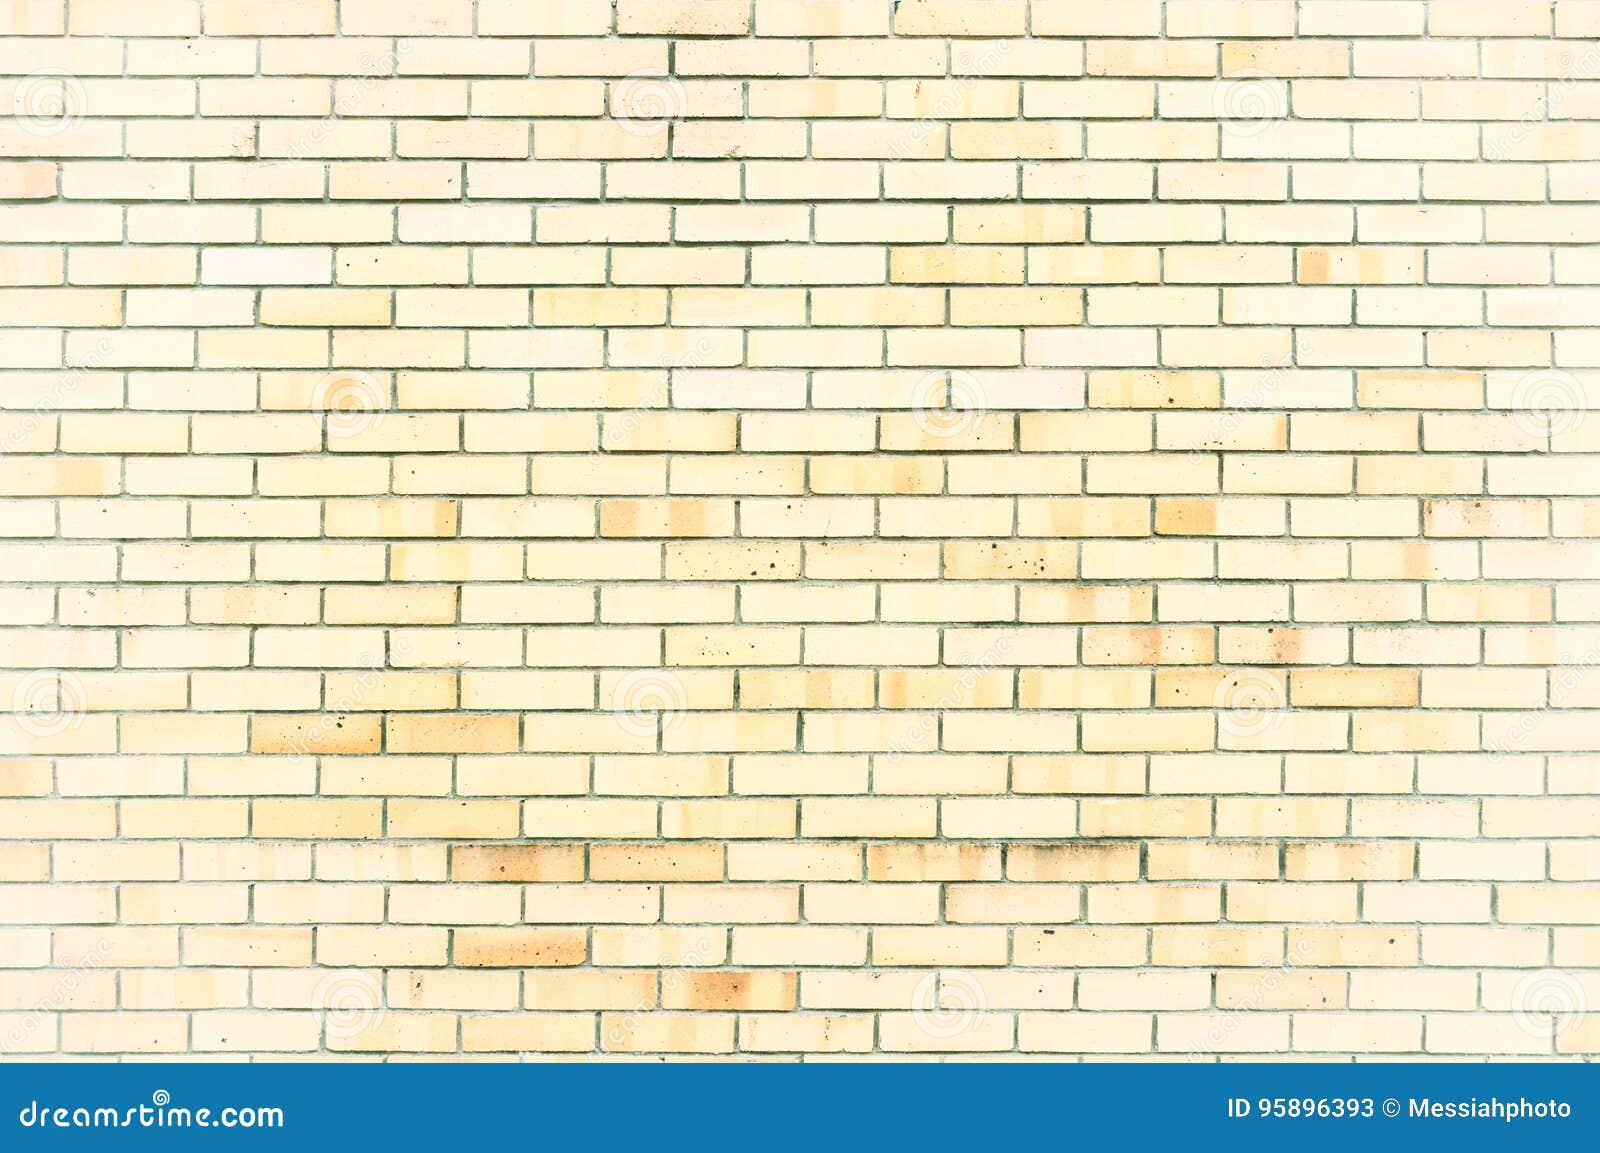 Amazing Decorative Brick Walls Elaboration - Wall Art Collections ...